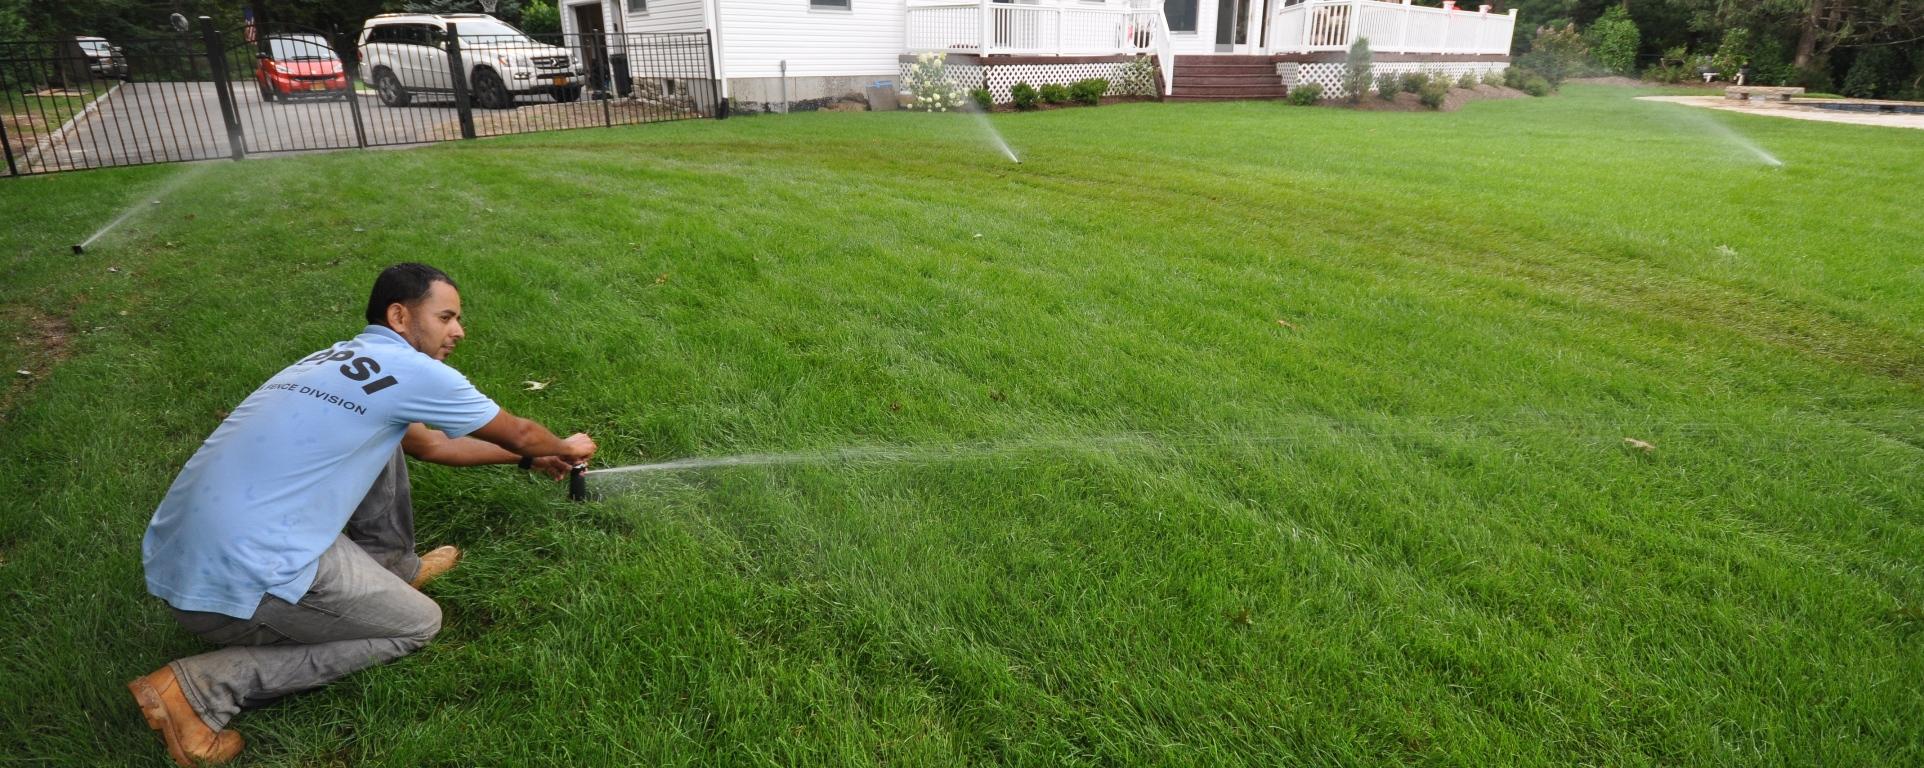 cleaning commercial kitchen countertops quartz sprinkler system long island ny | repair, garden ...